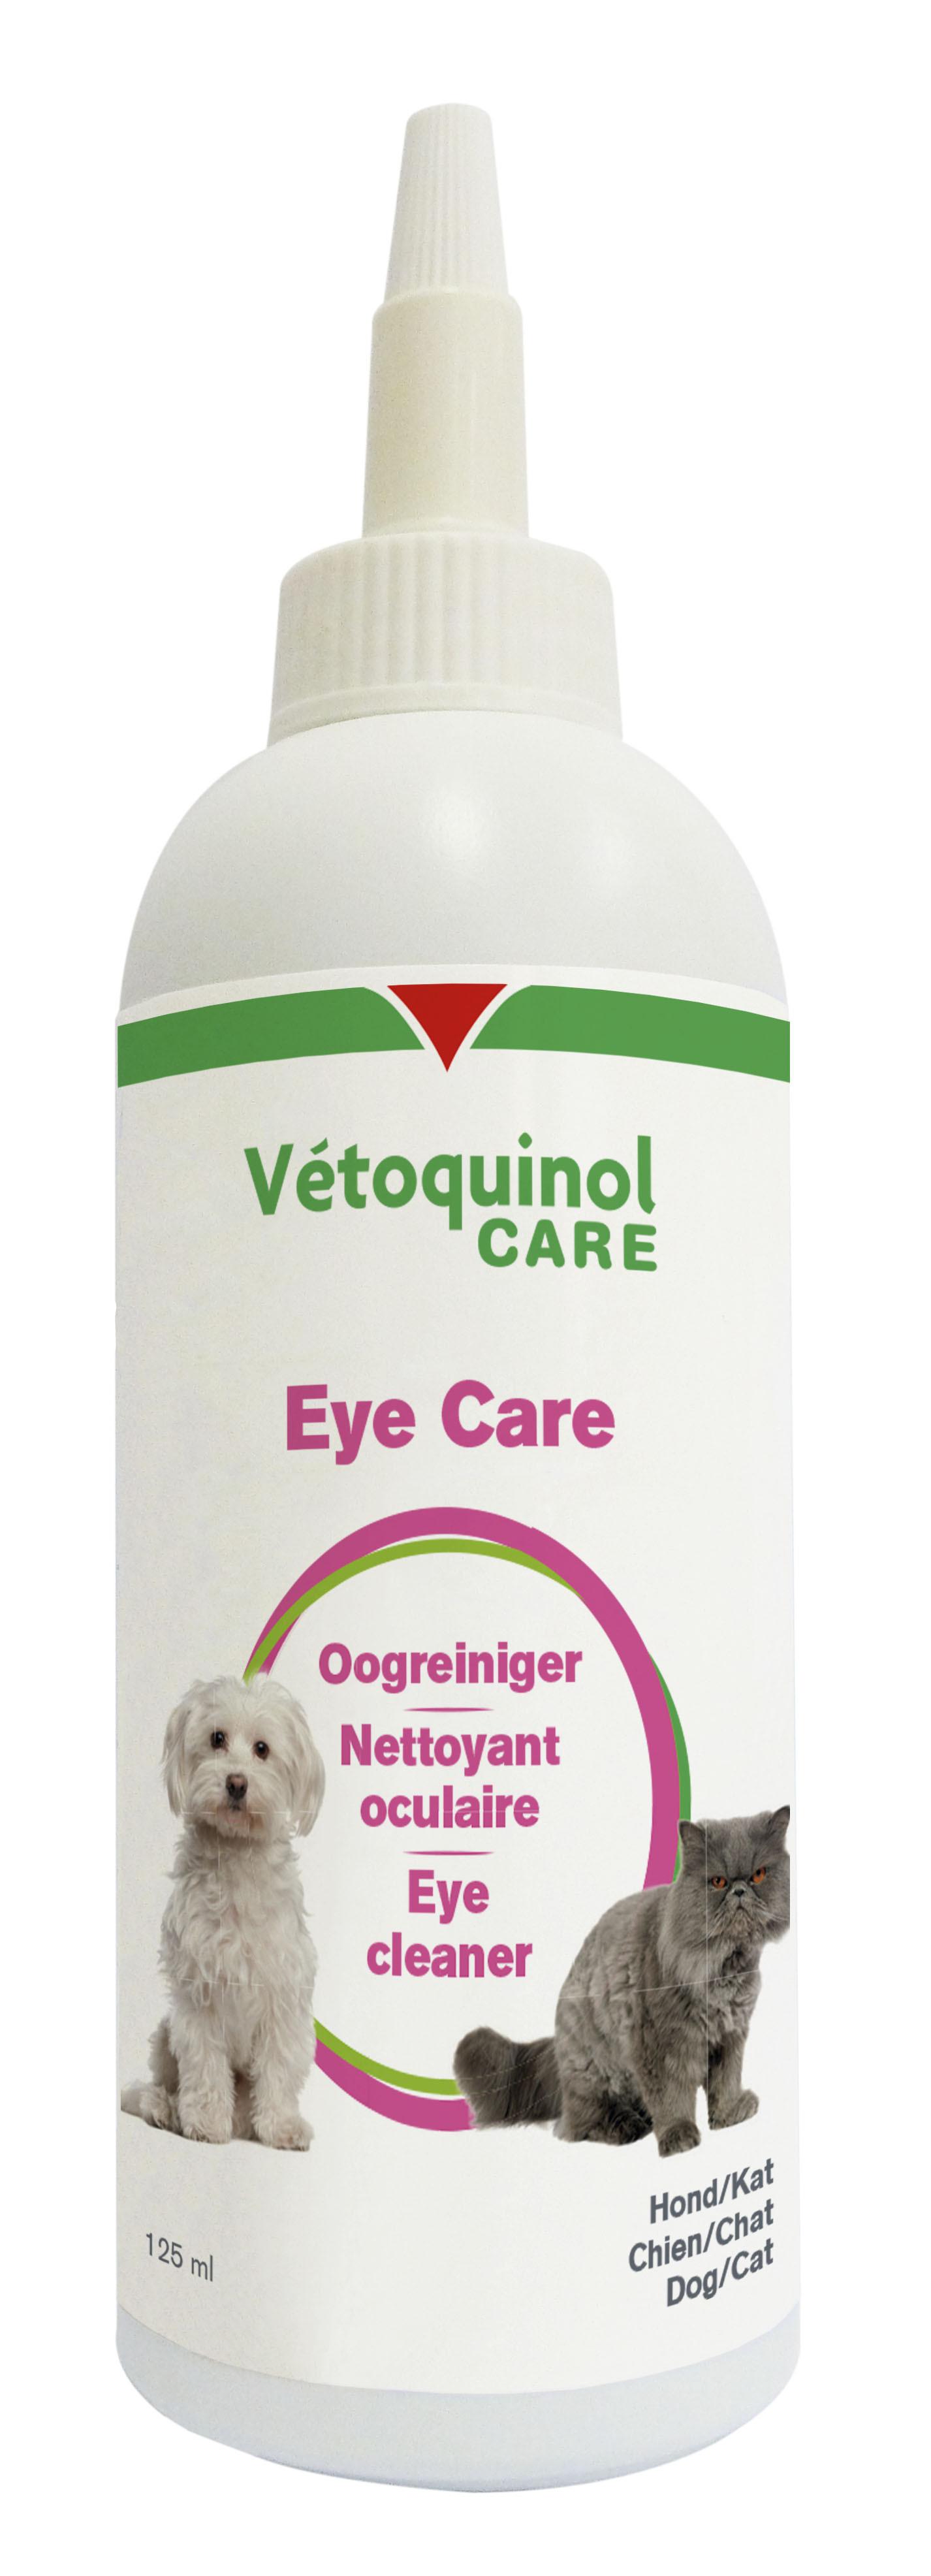 Vétoquinol Care Eye Care Oogreiniger voor hond en kat